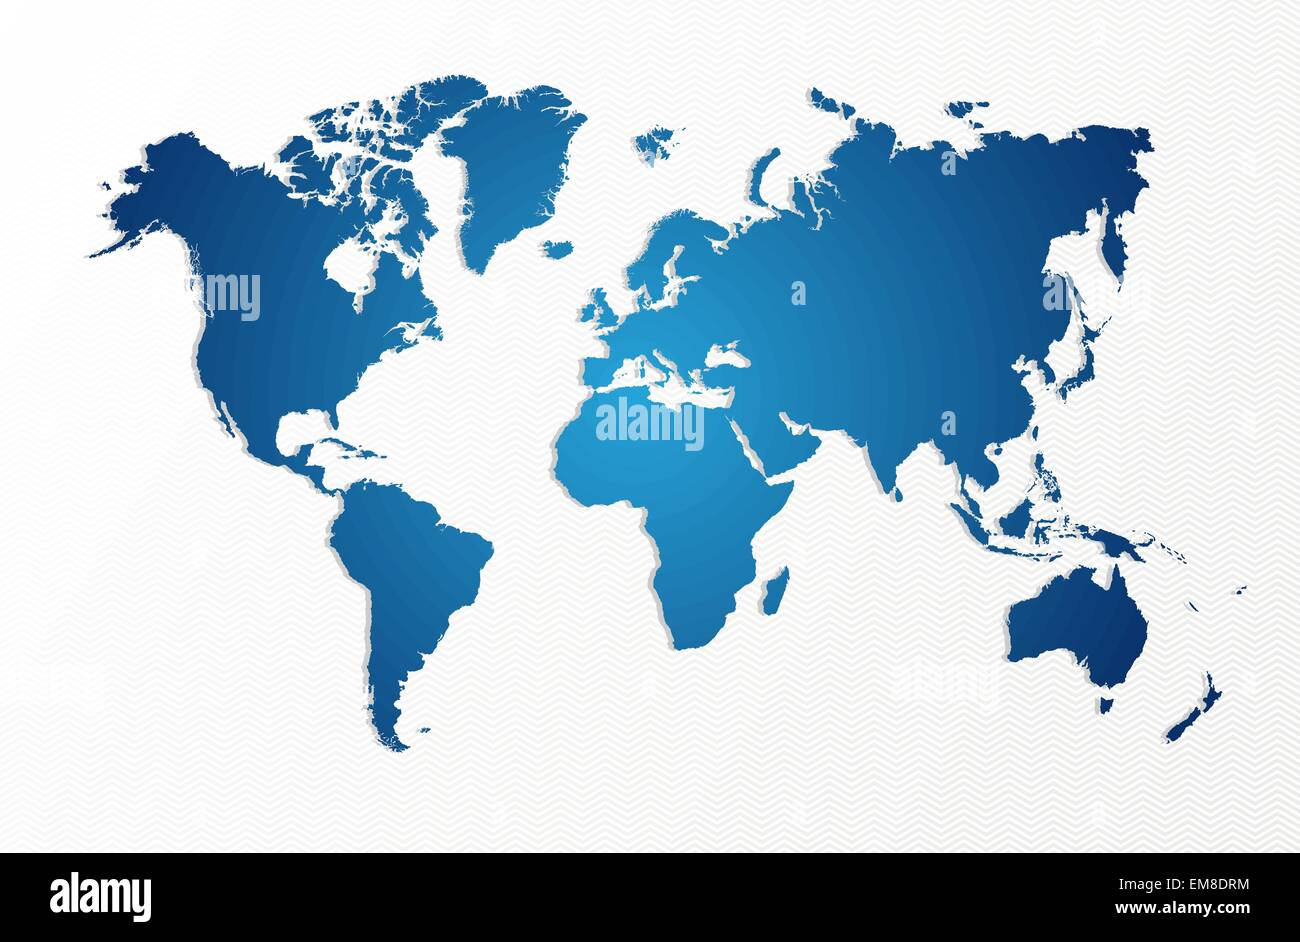 Blue World map isolated shape EPS10 vector file. - Stock Image